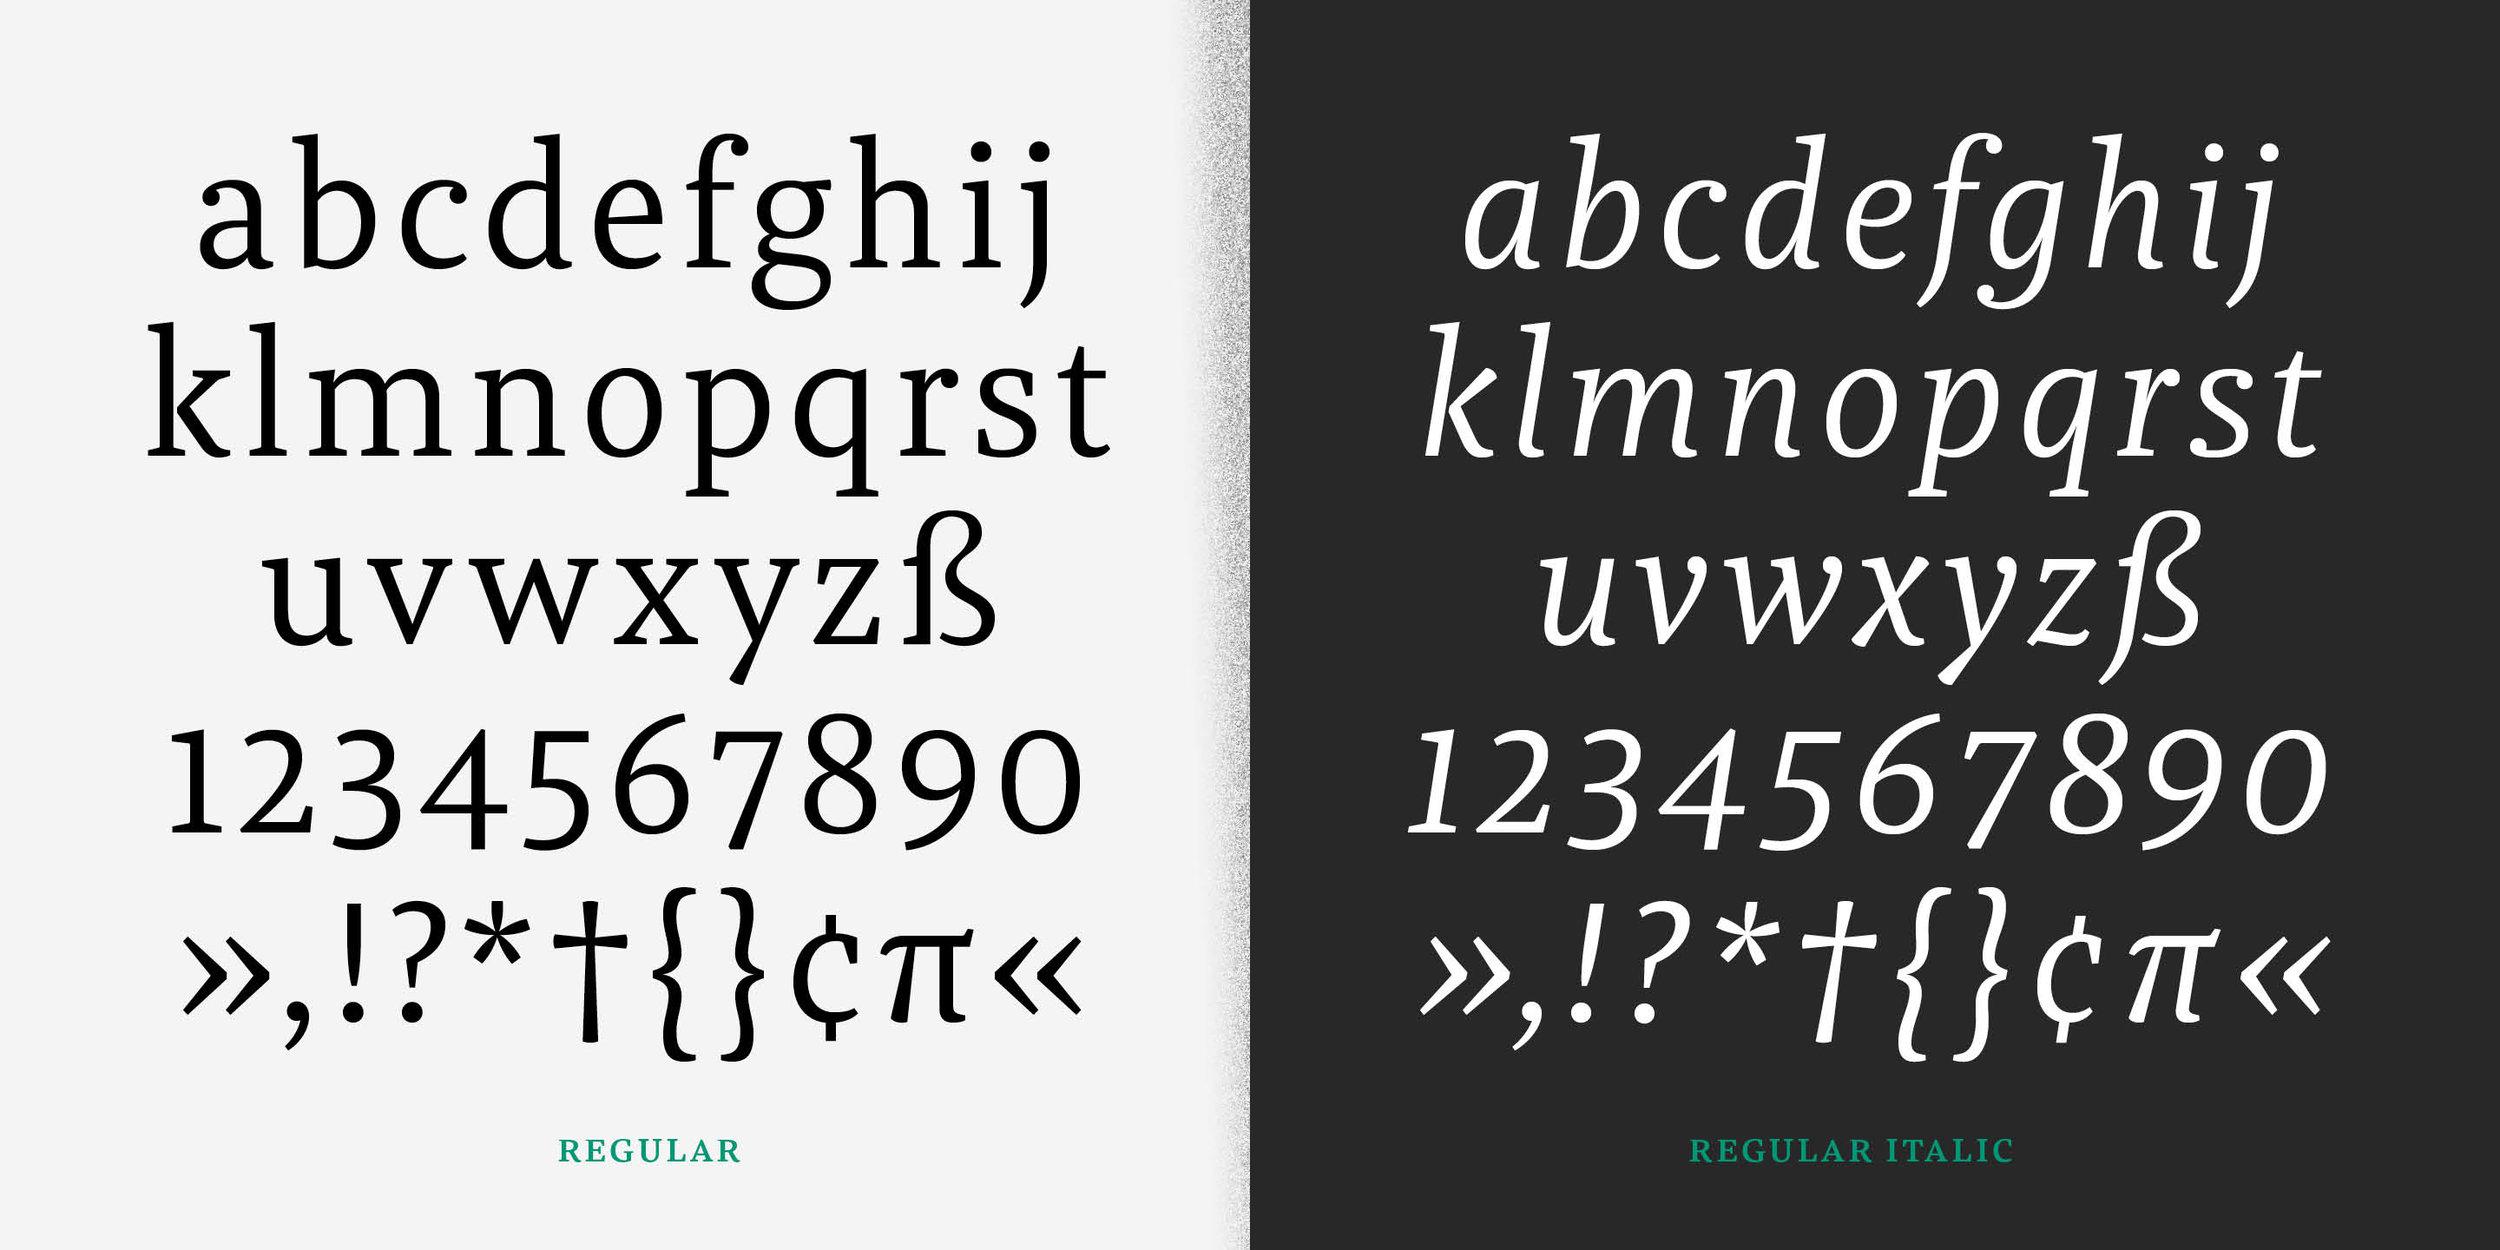 MeretPro-TypeMates-newspaper-editorial-typeface-font-2018-11.jpg